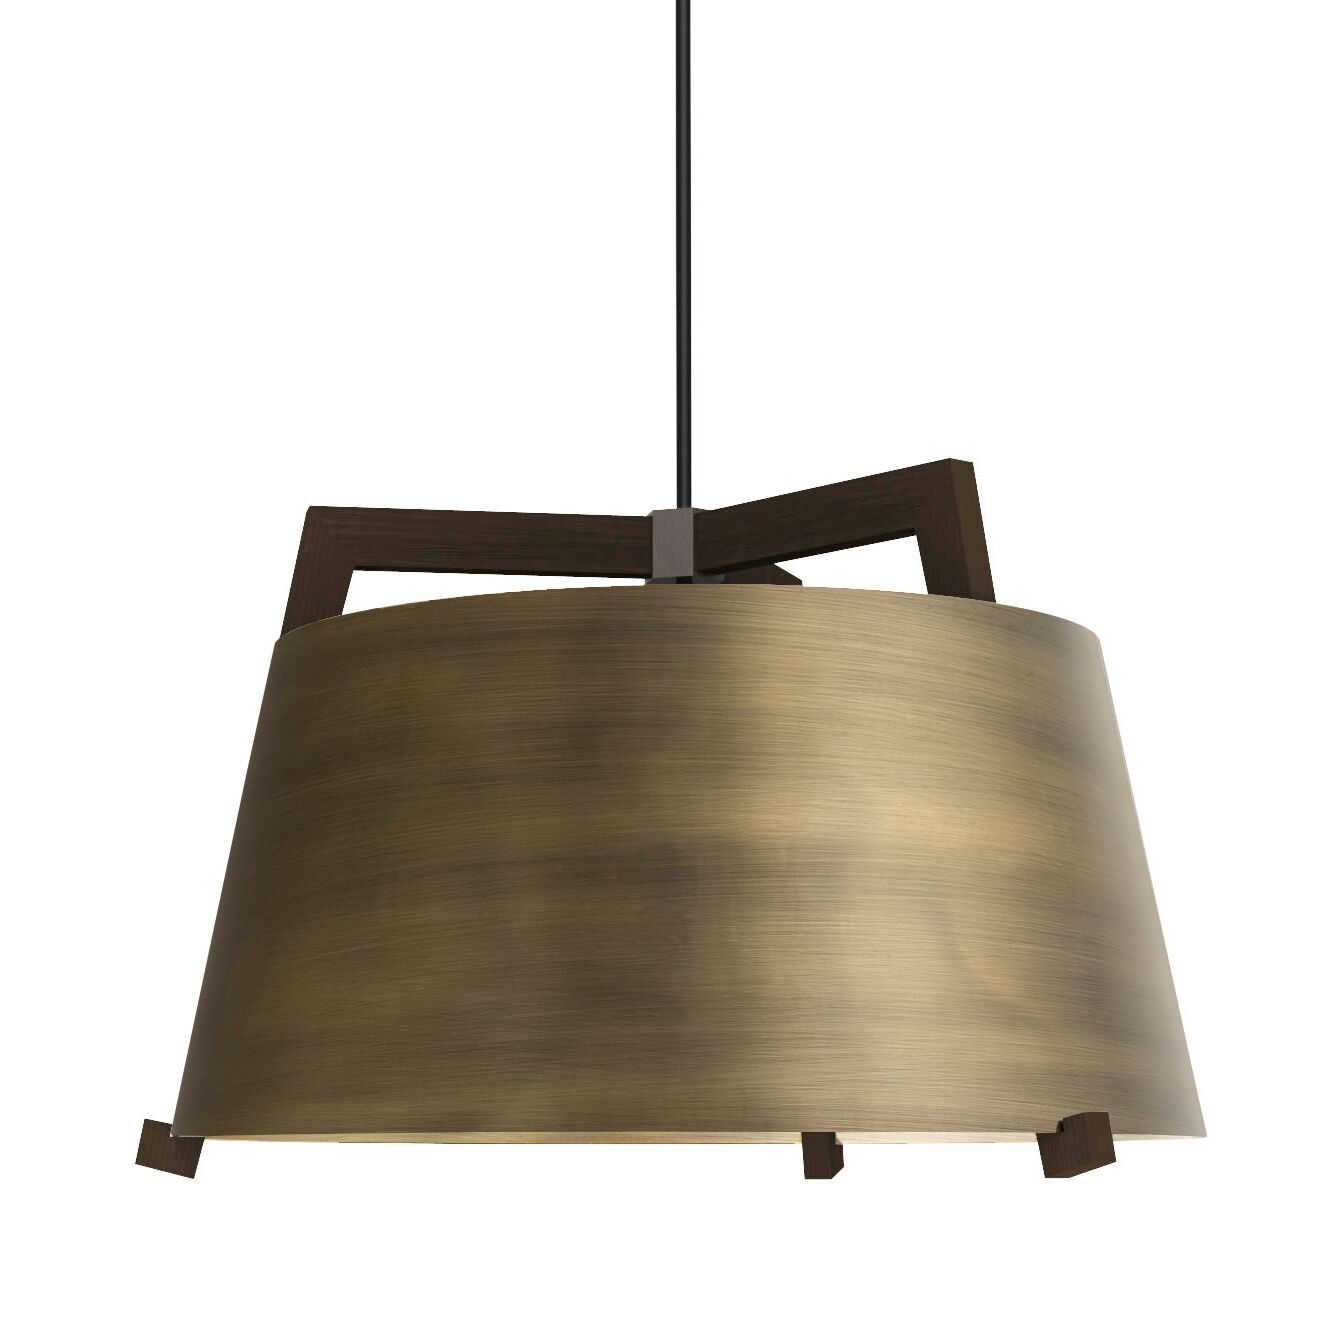 Ignis 1-Light Inverted Pendant Finish: Dark Stained Walnut/Distressed Brass